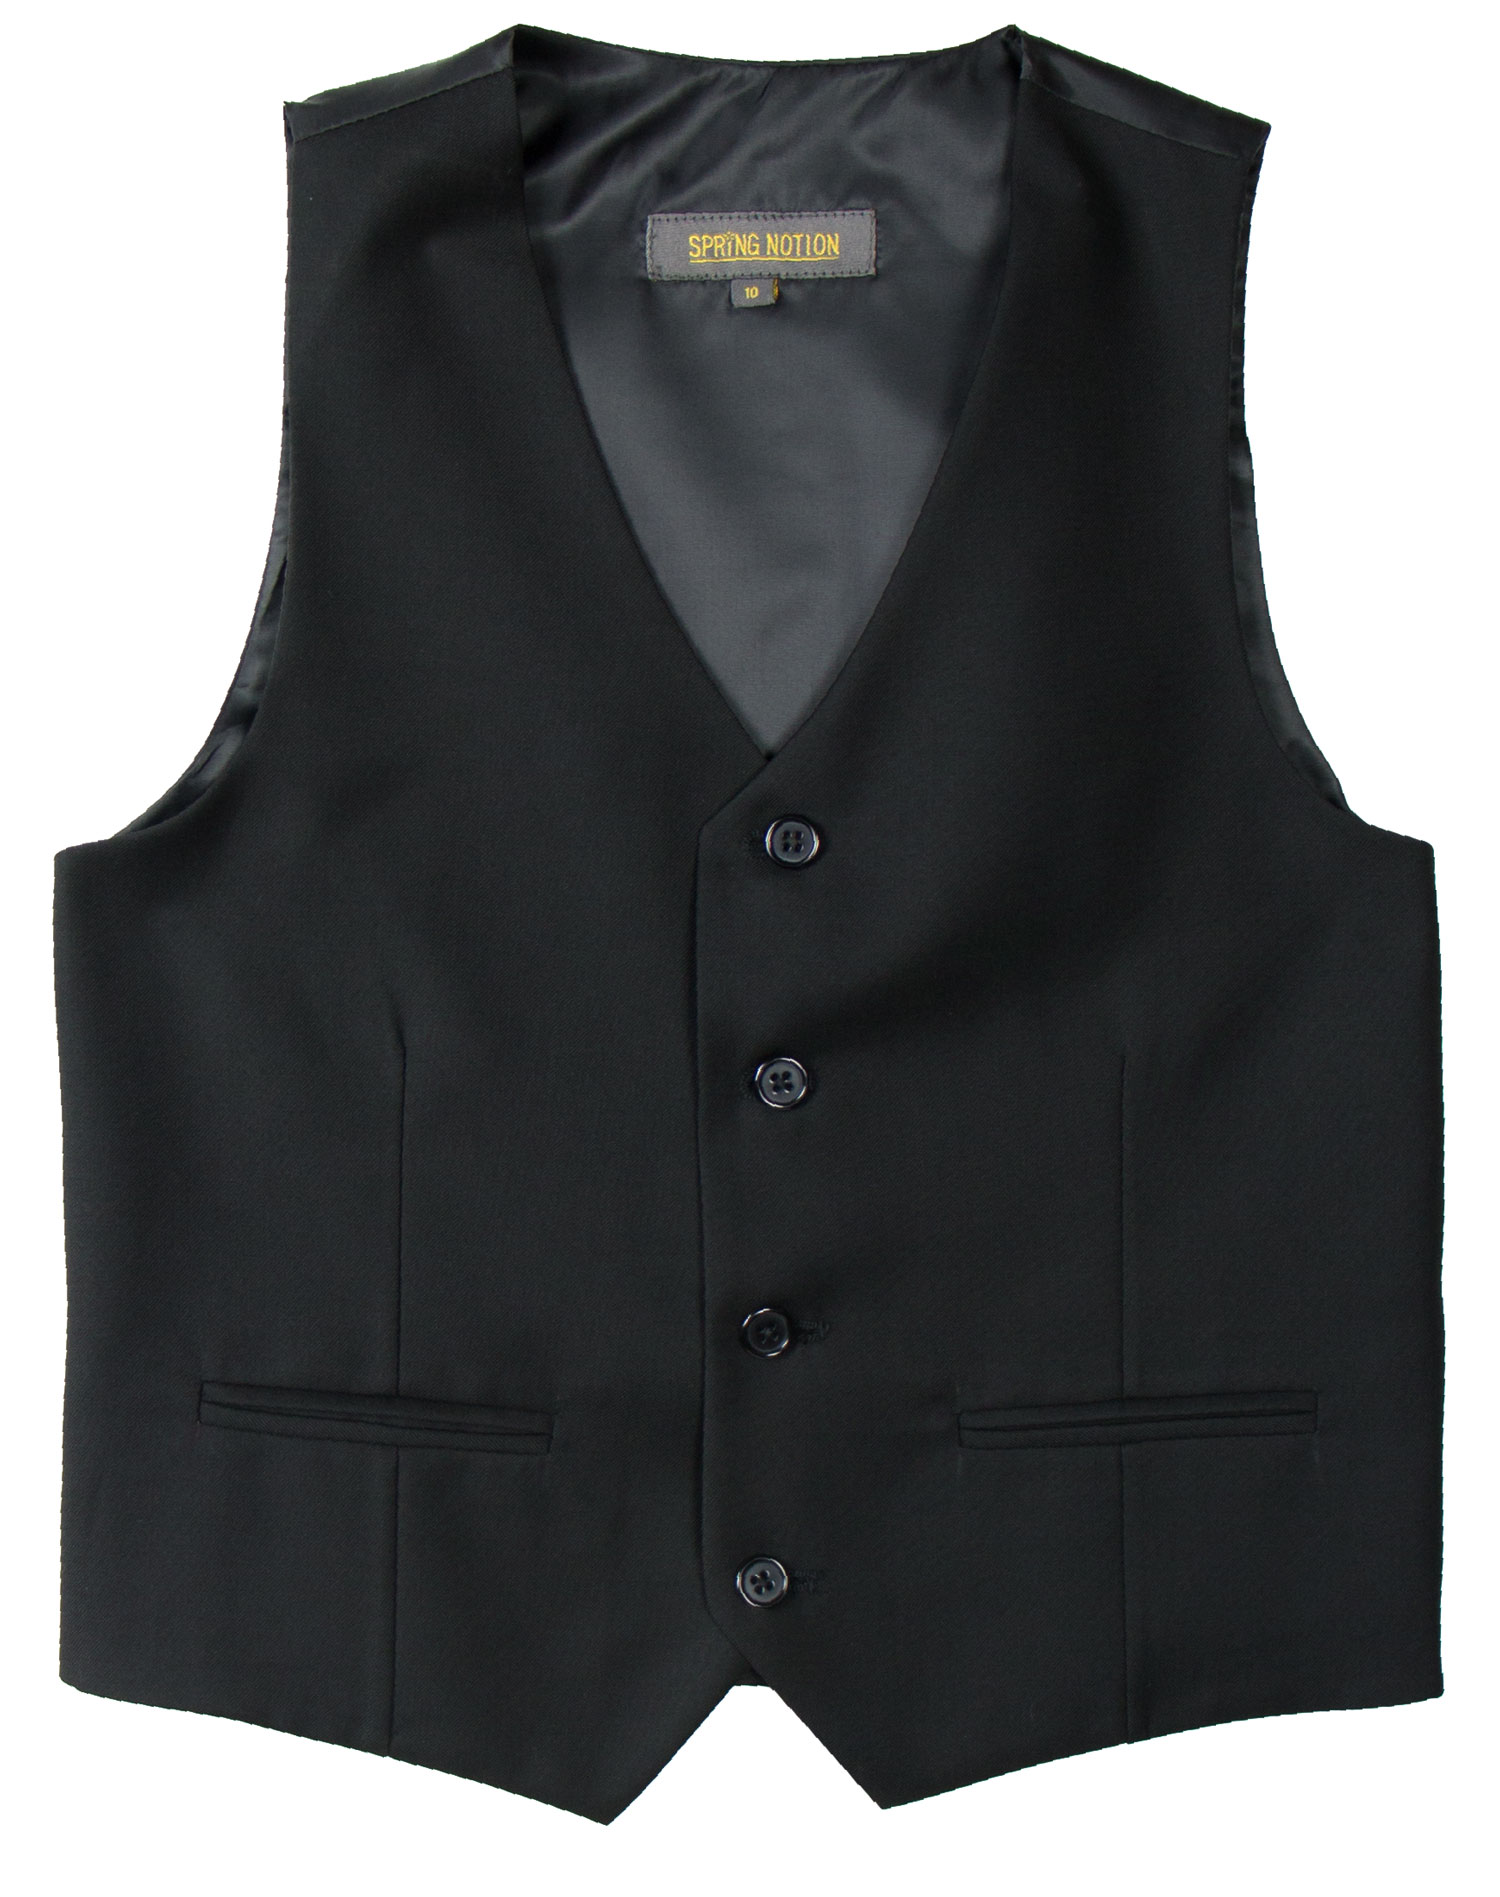 Spring Notion Big Boys' Two Button Suit Vest, Charcoal